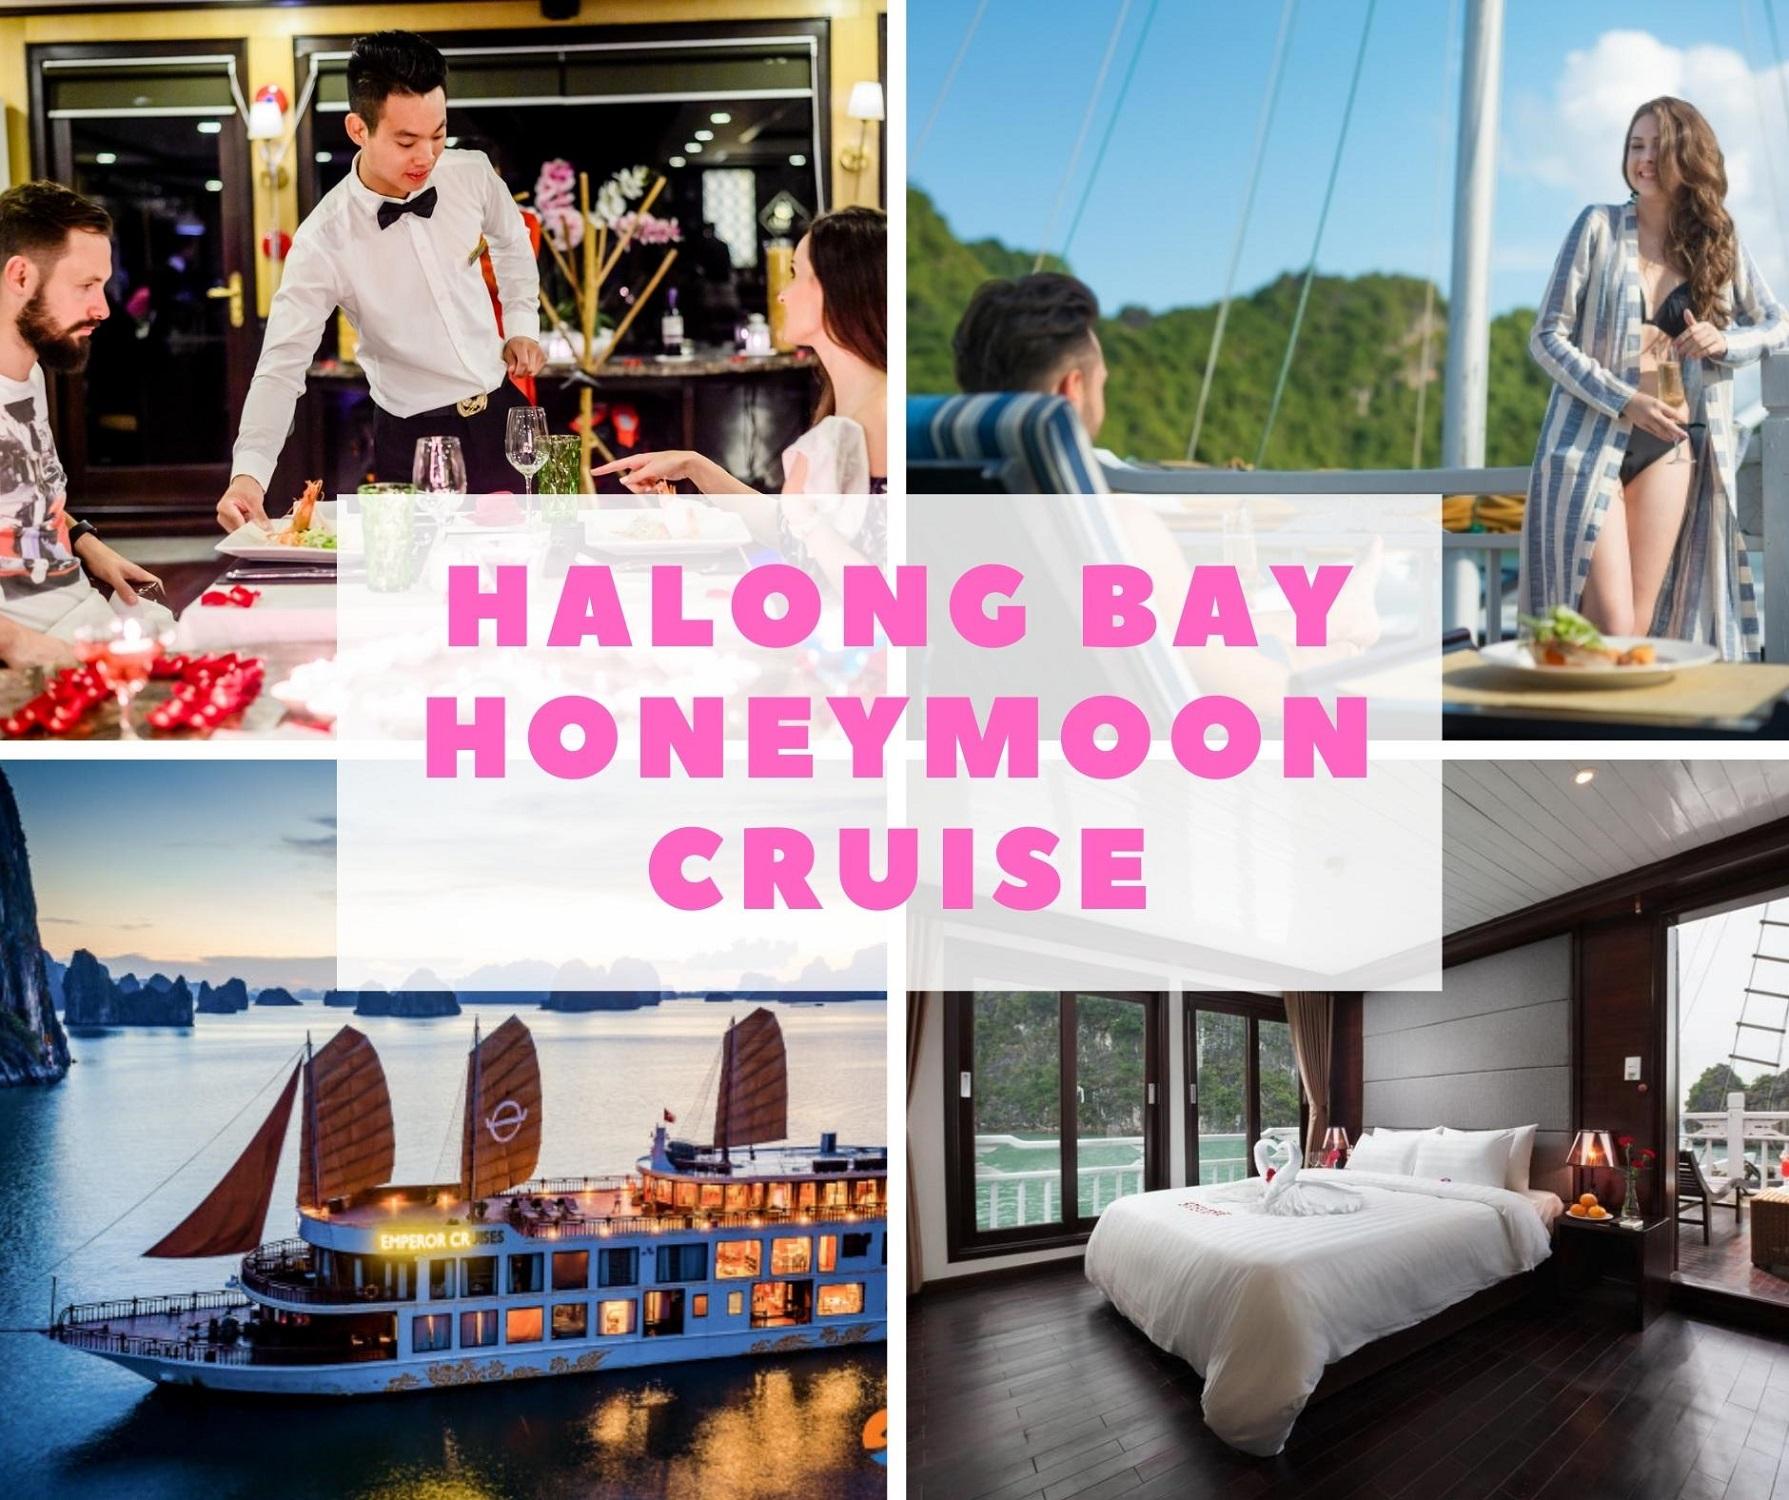 Halong Bay Honeymoon Cruise